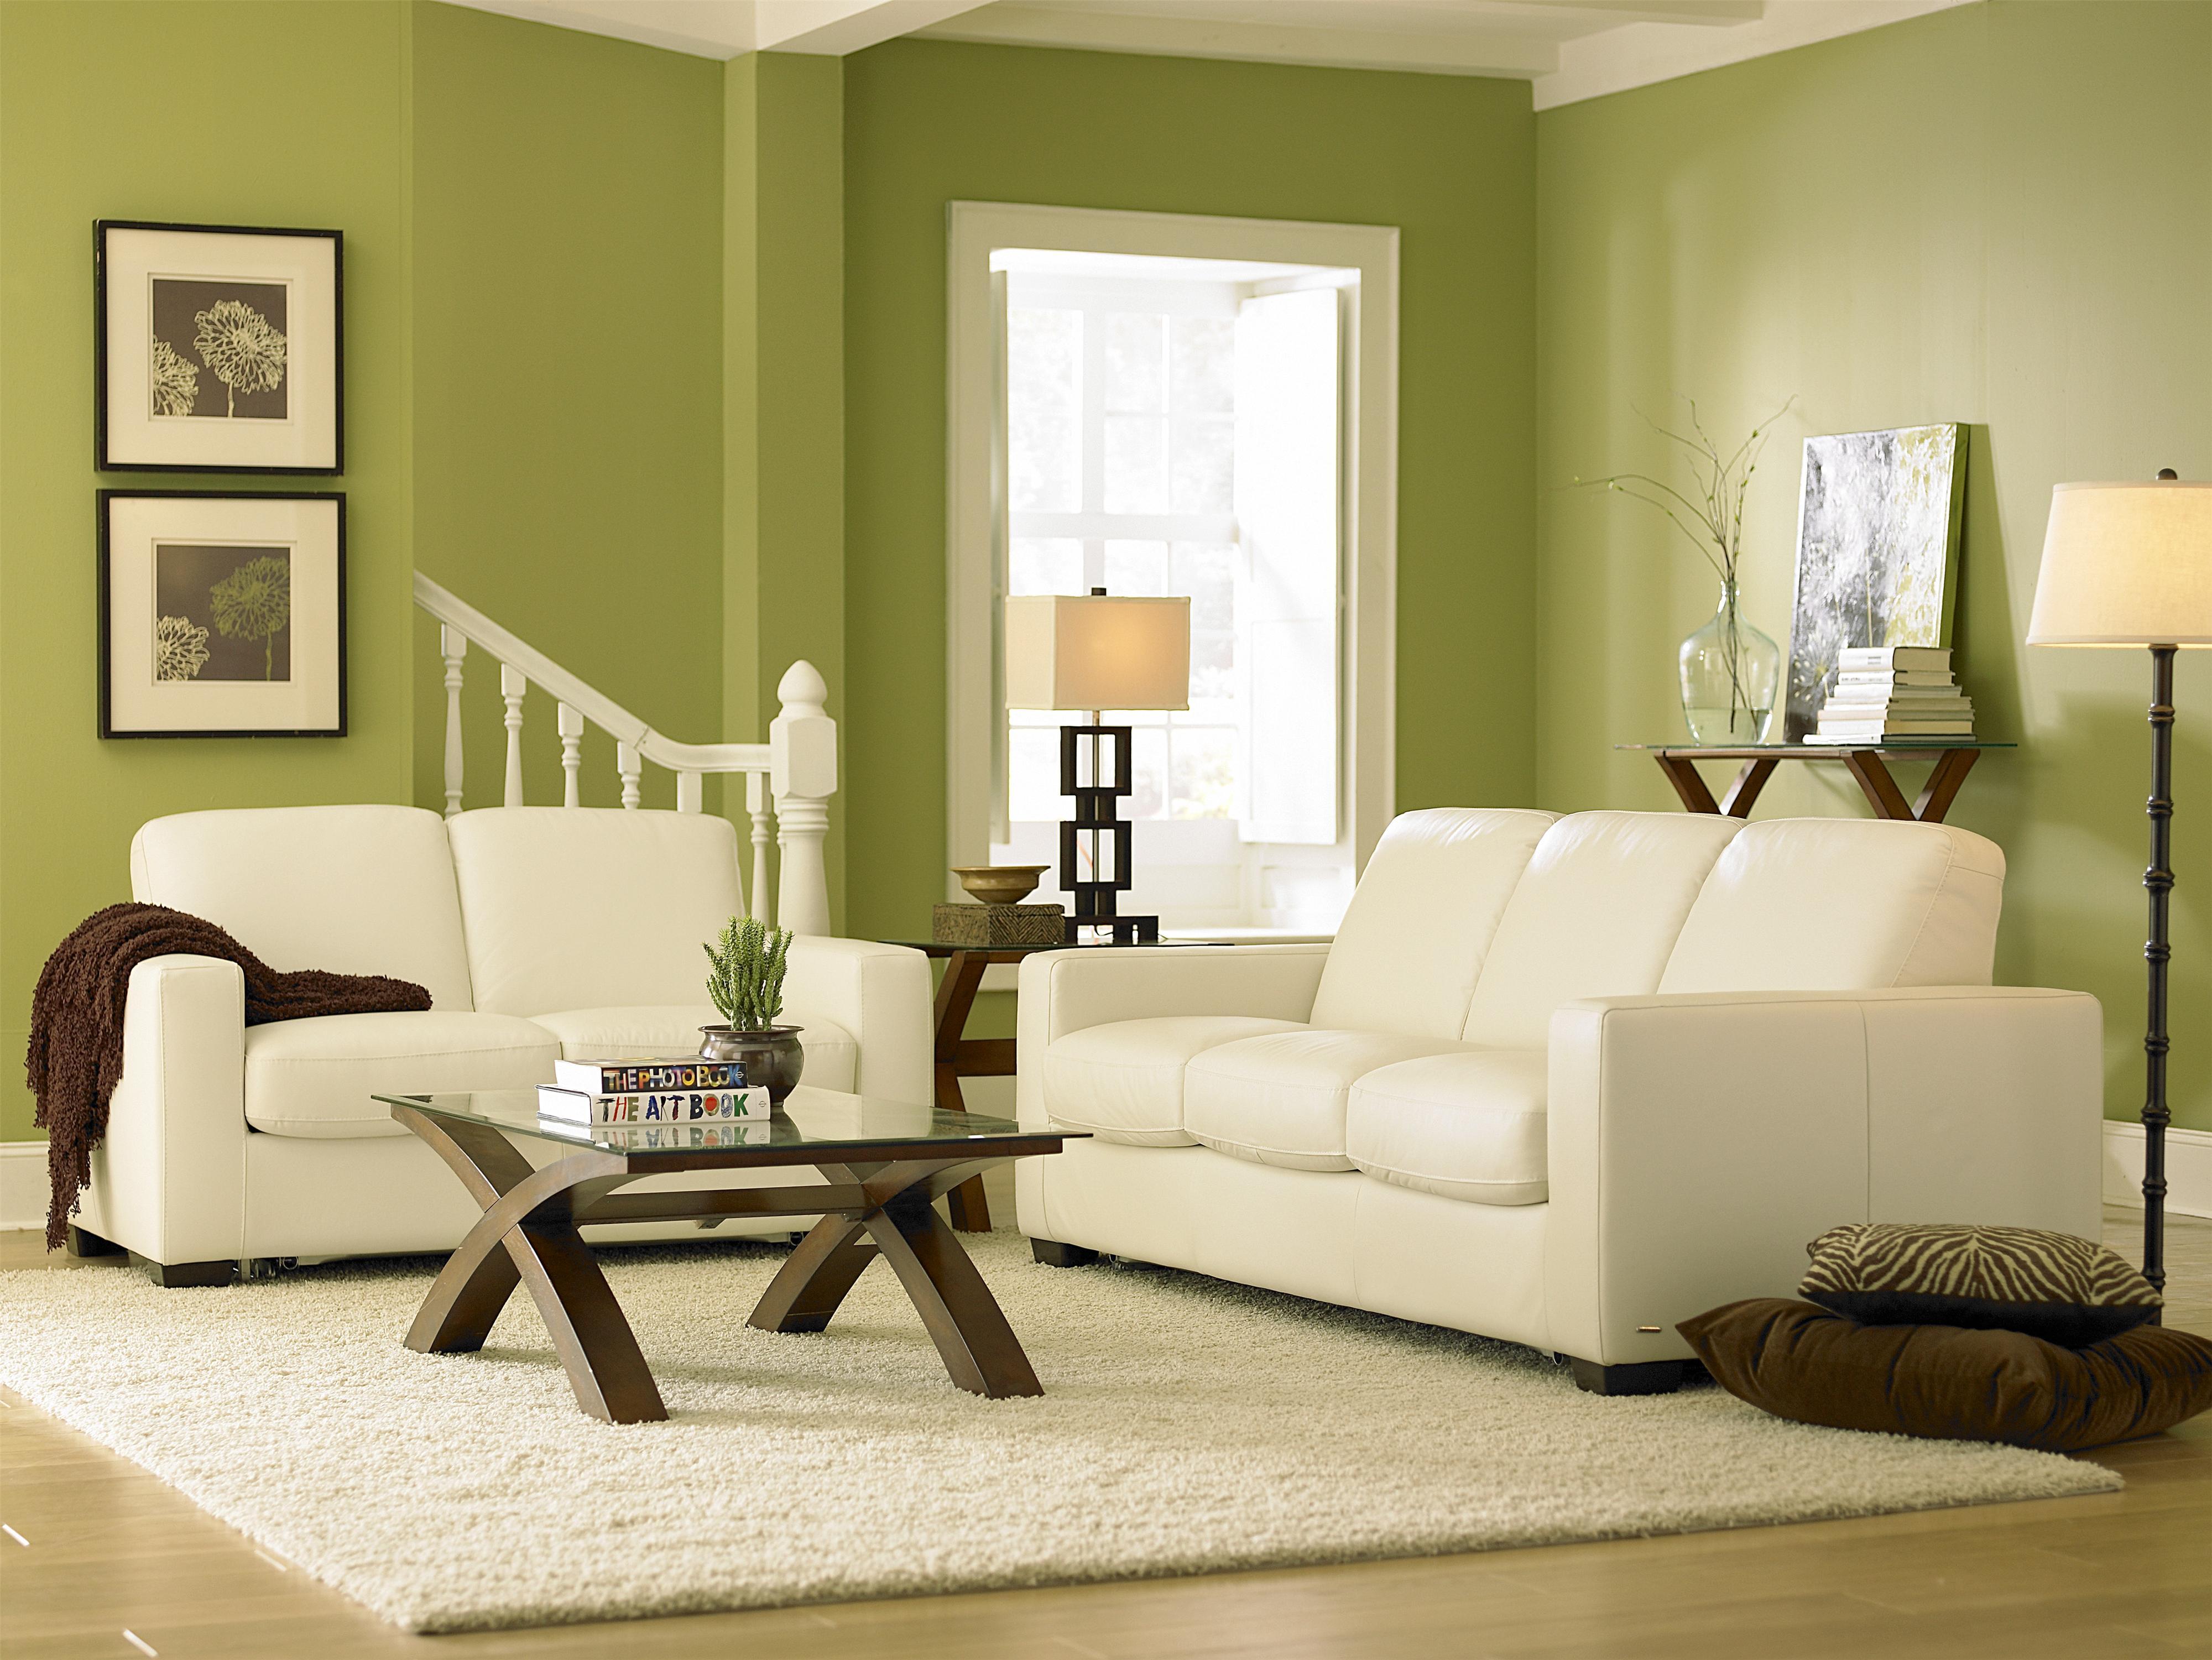 Natuzzi Editions At Baer's Furniture